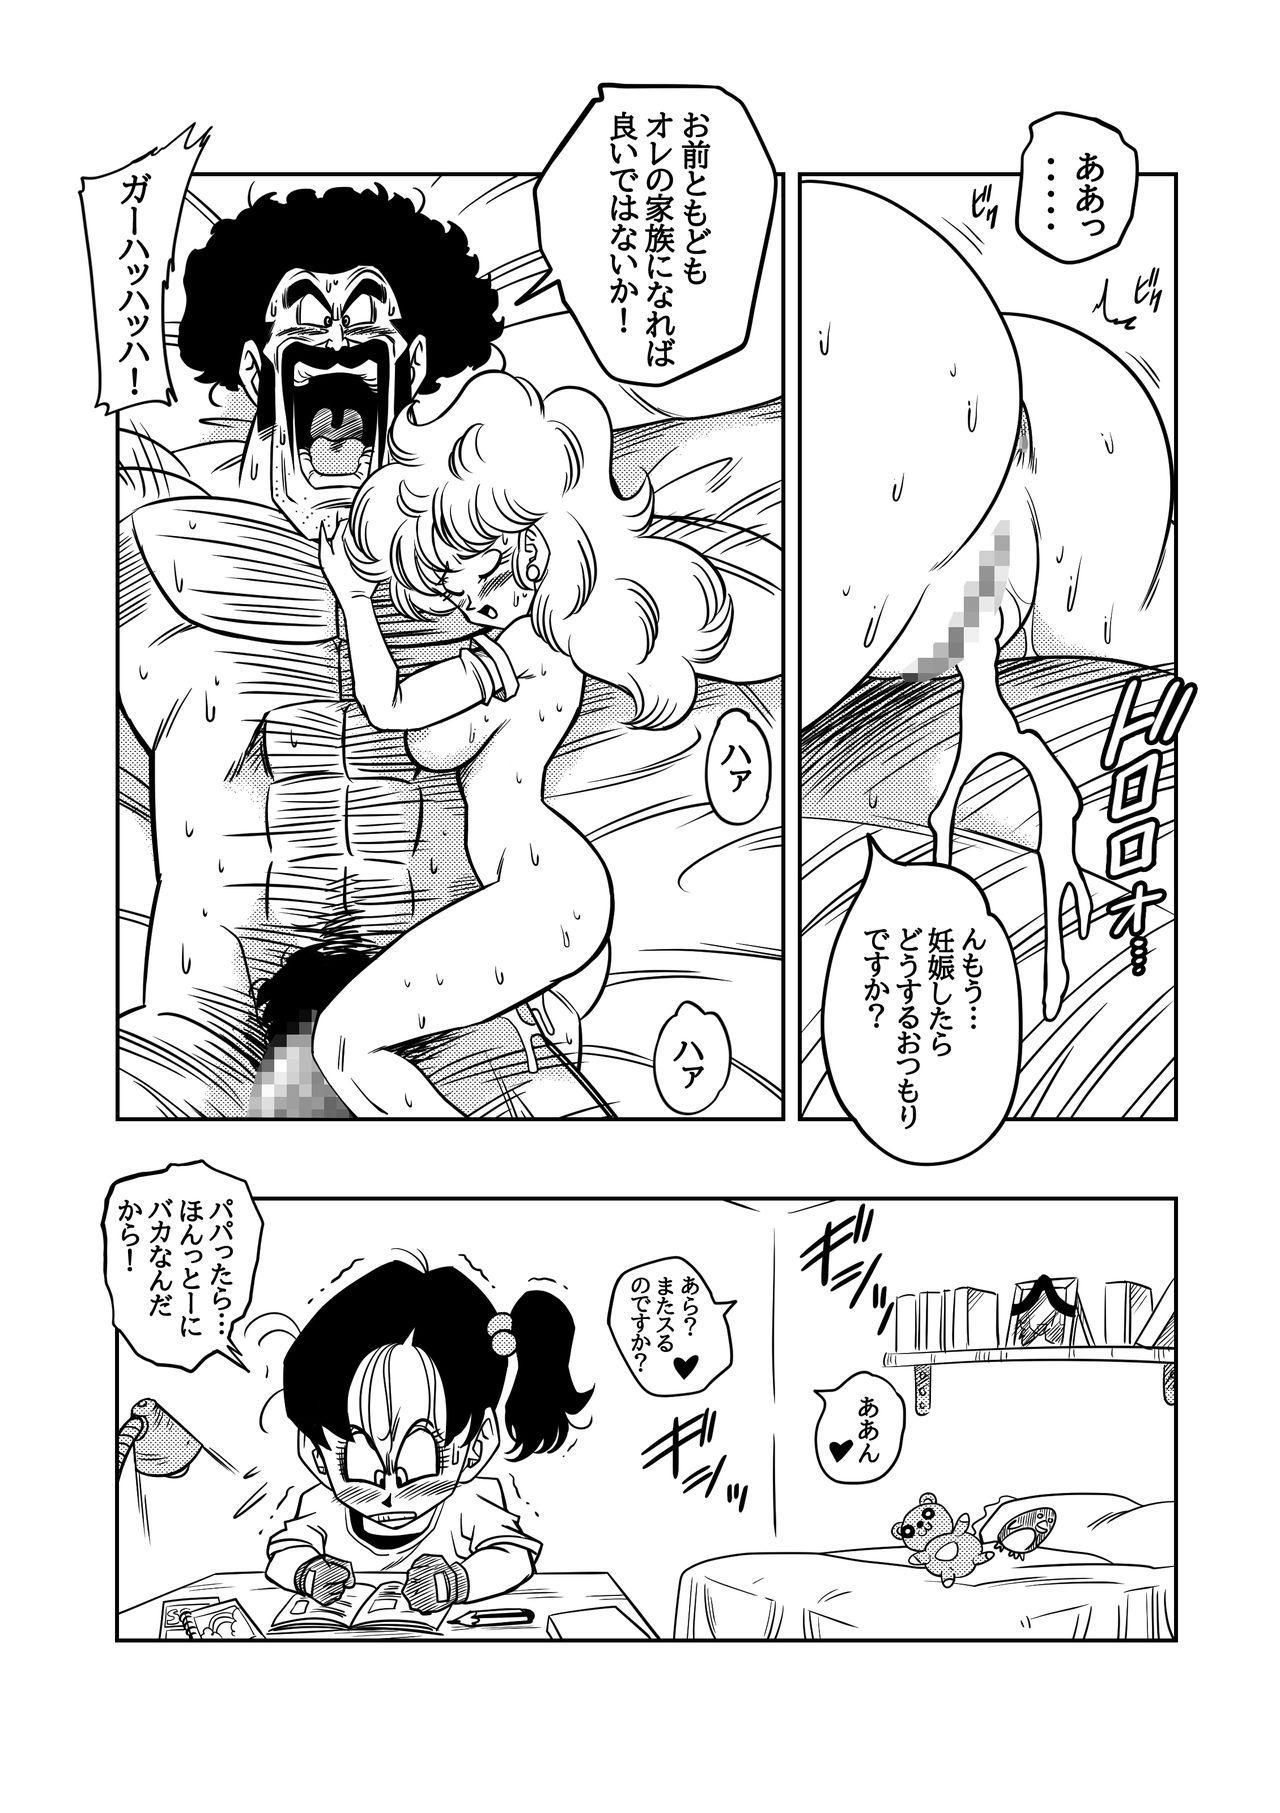 Mister Satan no Himitsu no Training 18